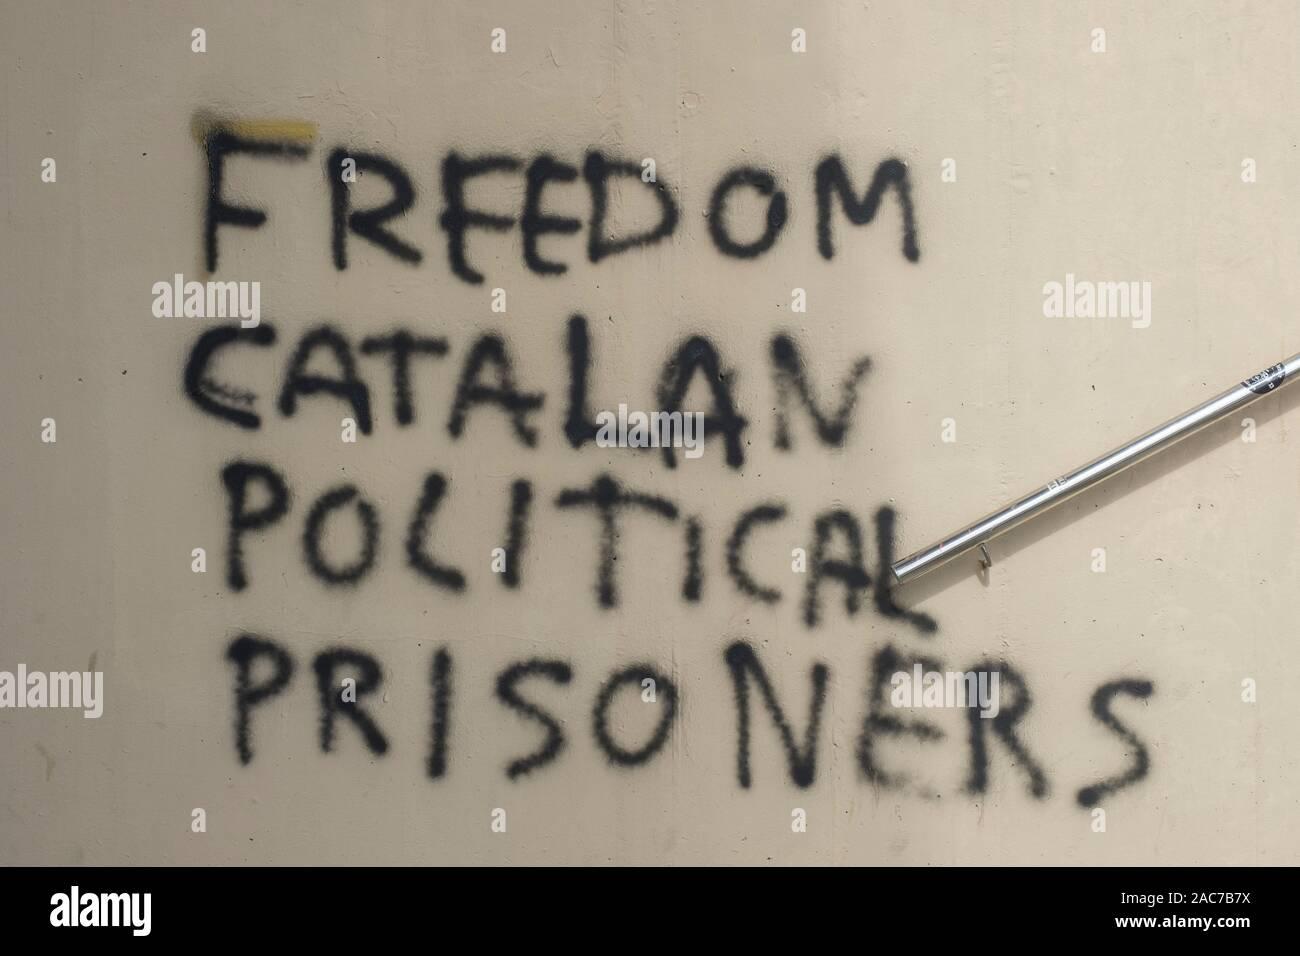 """Free Political Prisoners' graffiti daubed on a wall in Barcelona. Stock Photo"